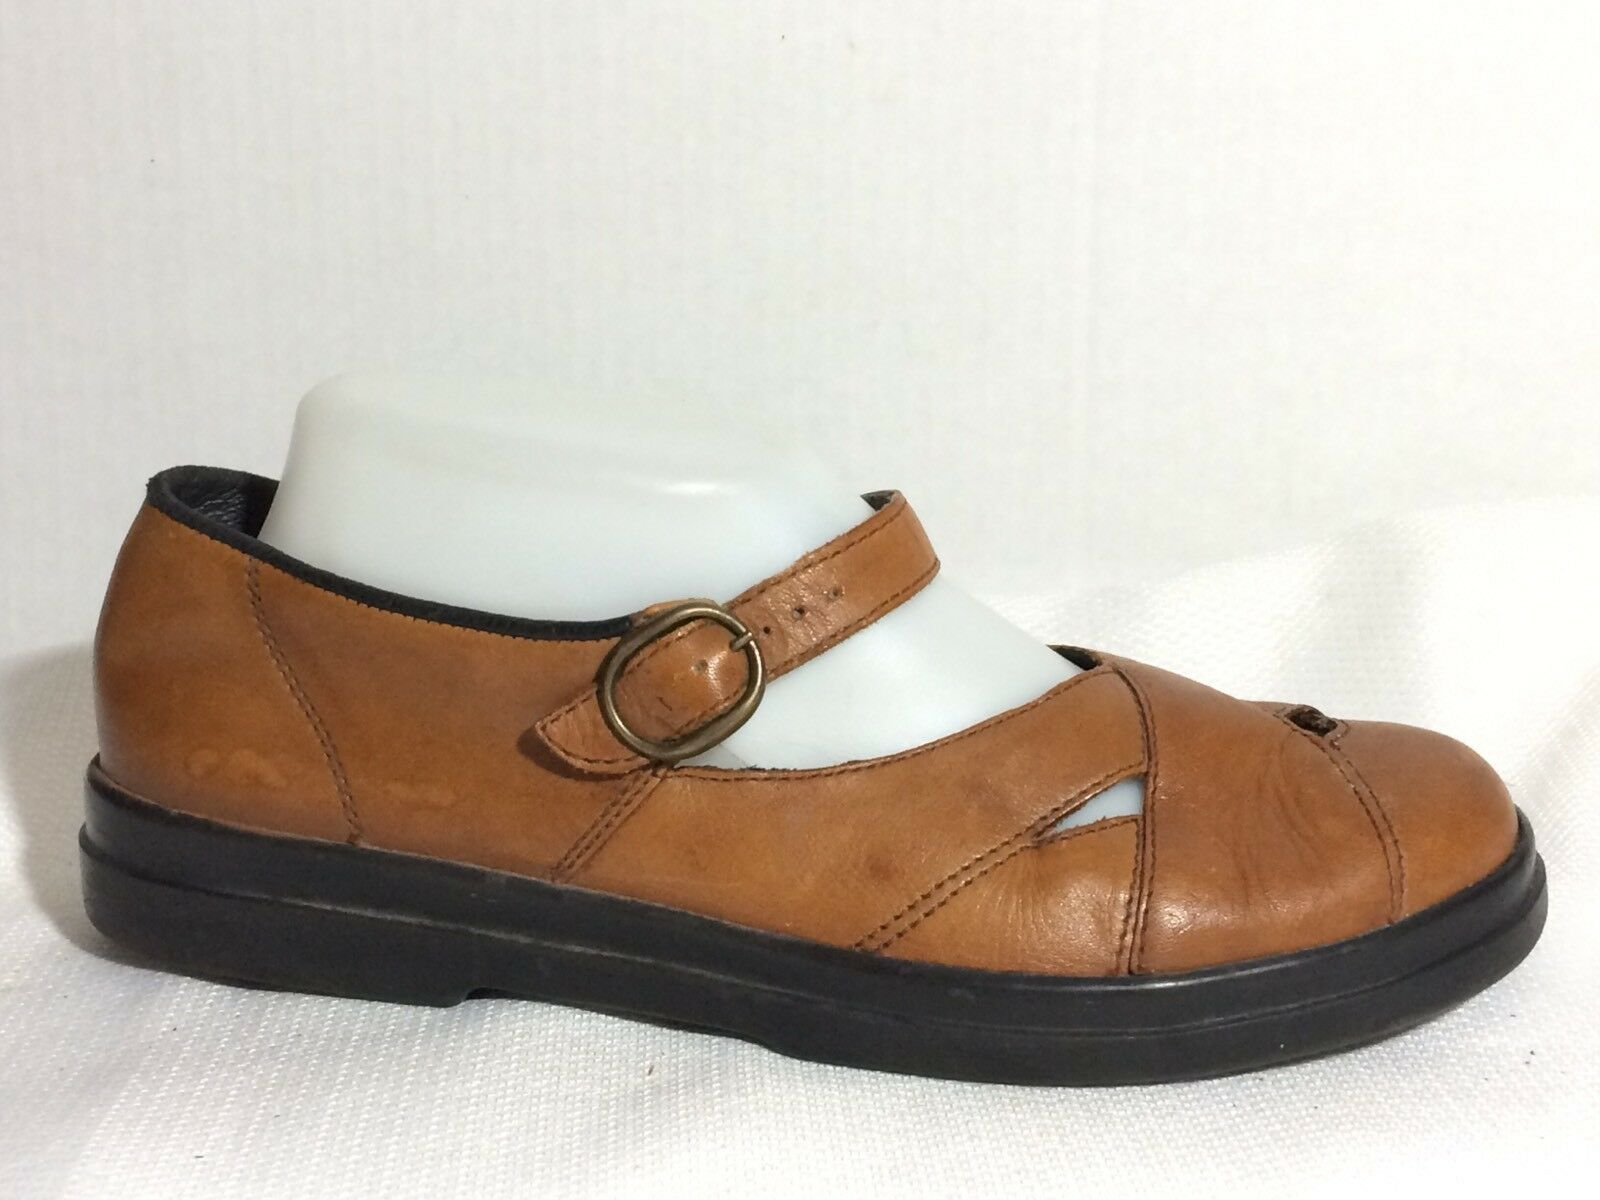 Rieker Women 9 M Antistress Light Brown Mary Jane Leather Loafer Flat Shoe